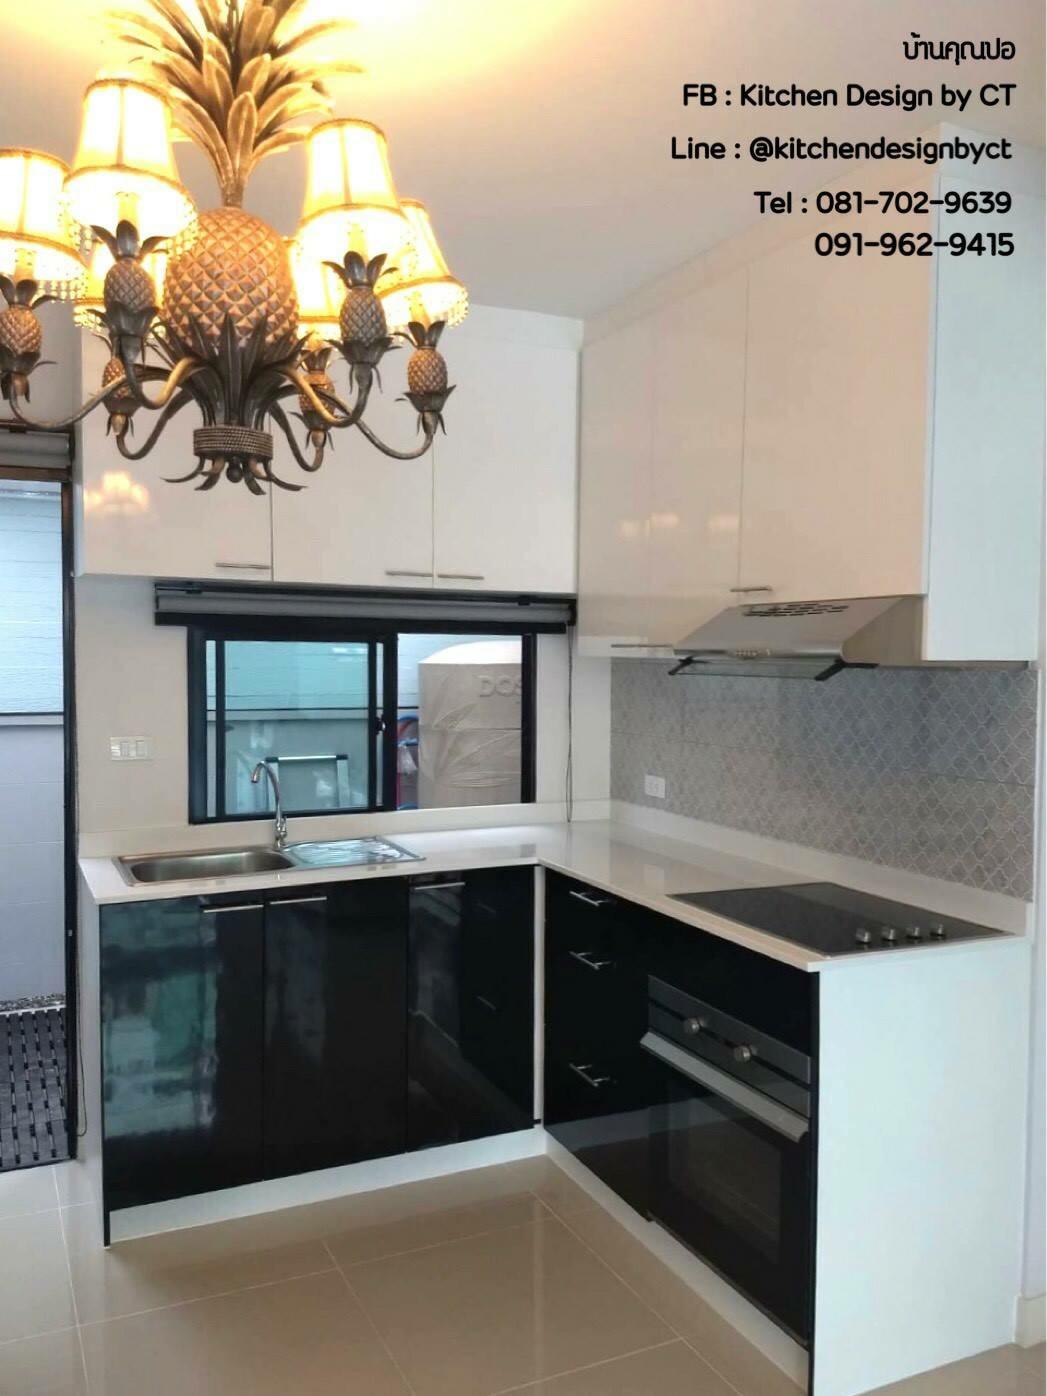 Modern Black & White Kitchen (ชุดครัวบิวท์อินสีขาว-ดำสไตล์โมเดิร์น)